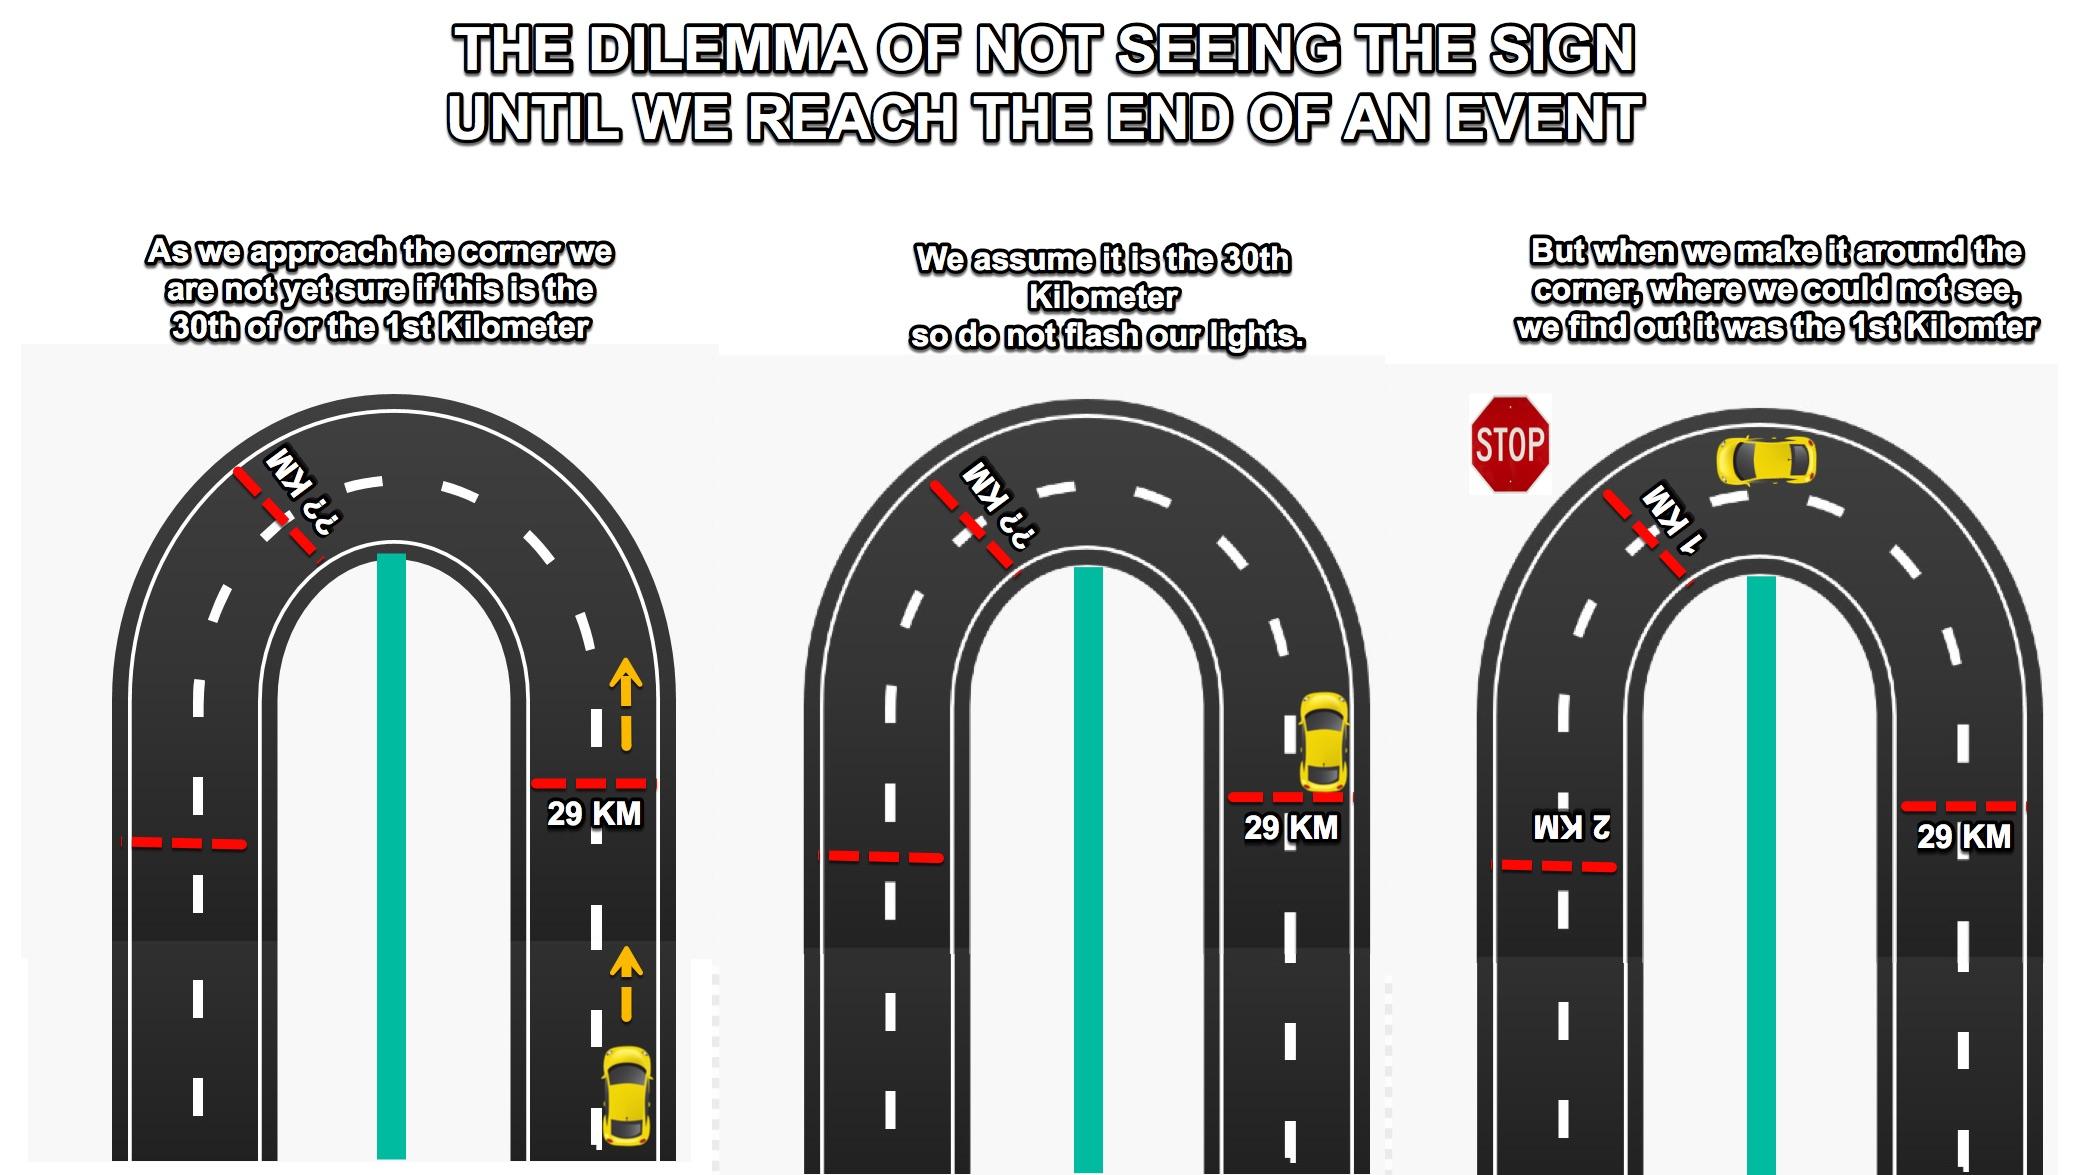 Dilemma 3